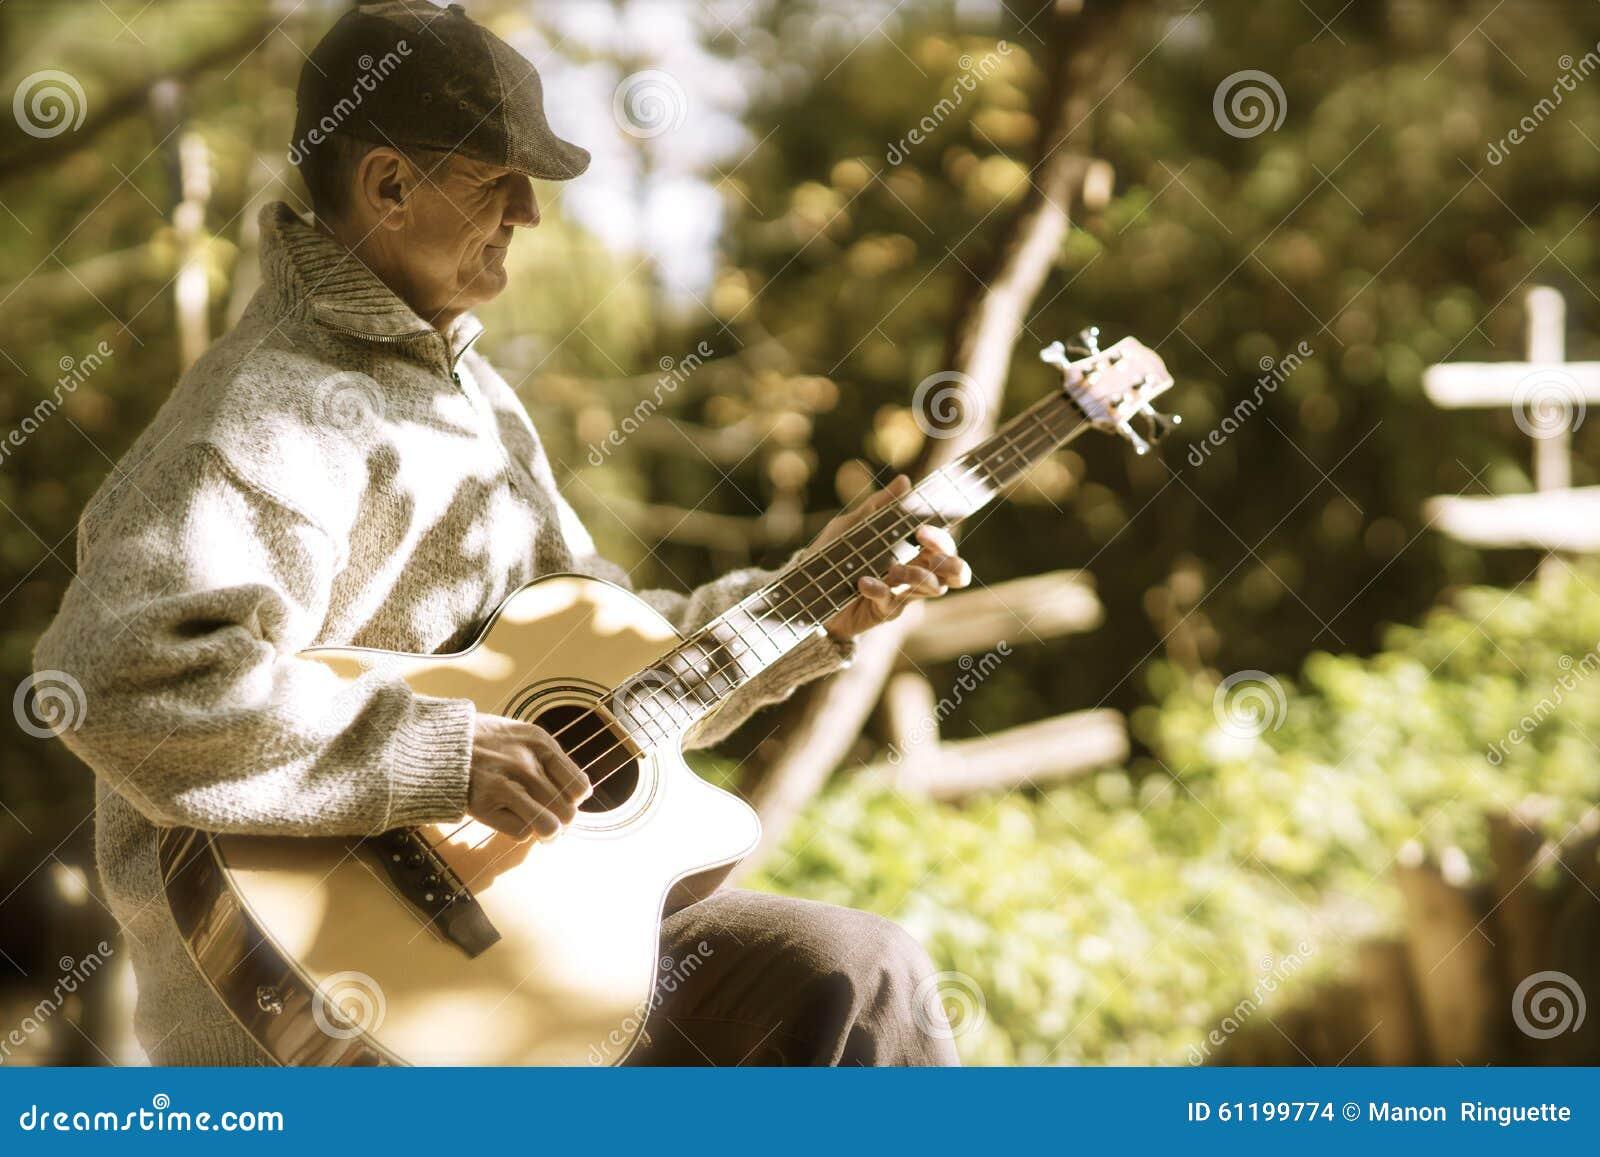 Klinka gitarren i eftermiddagljus